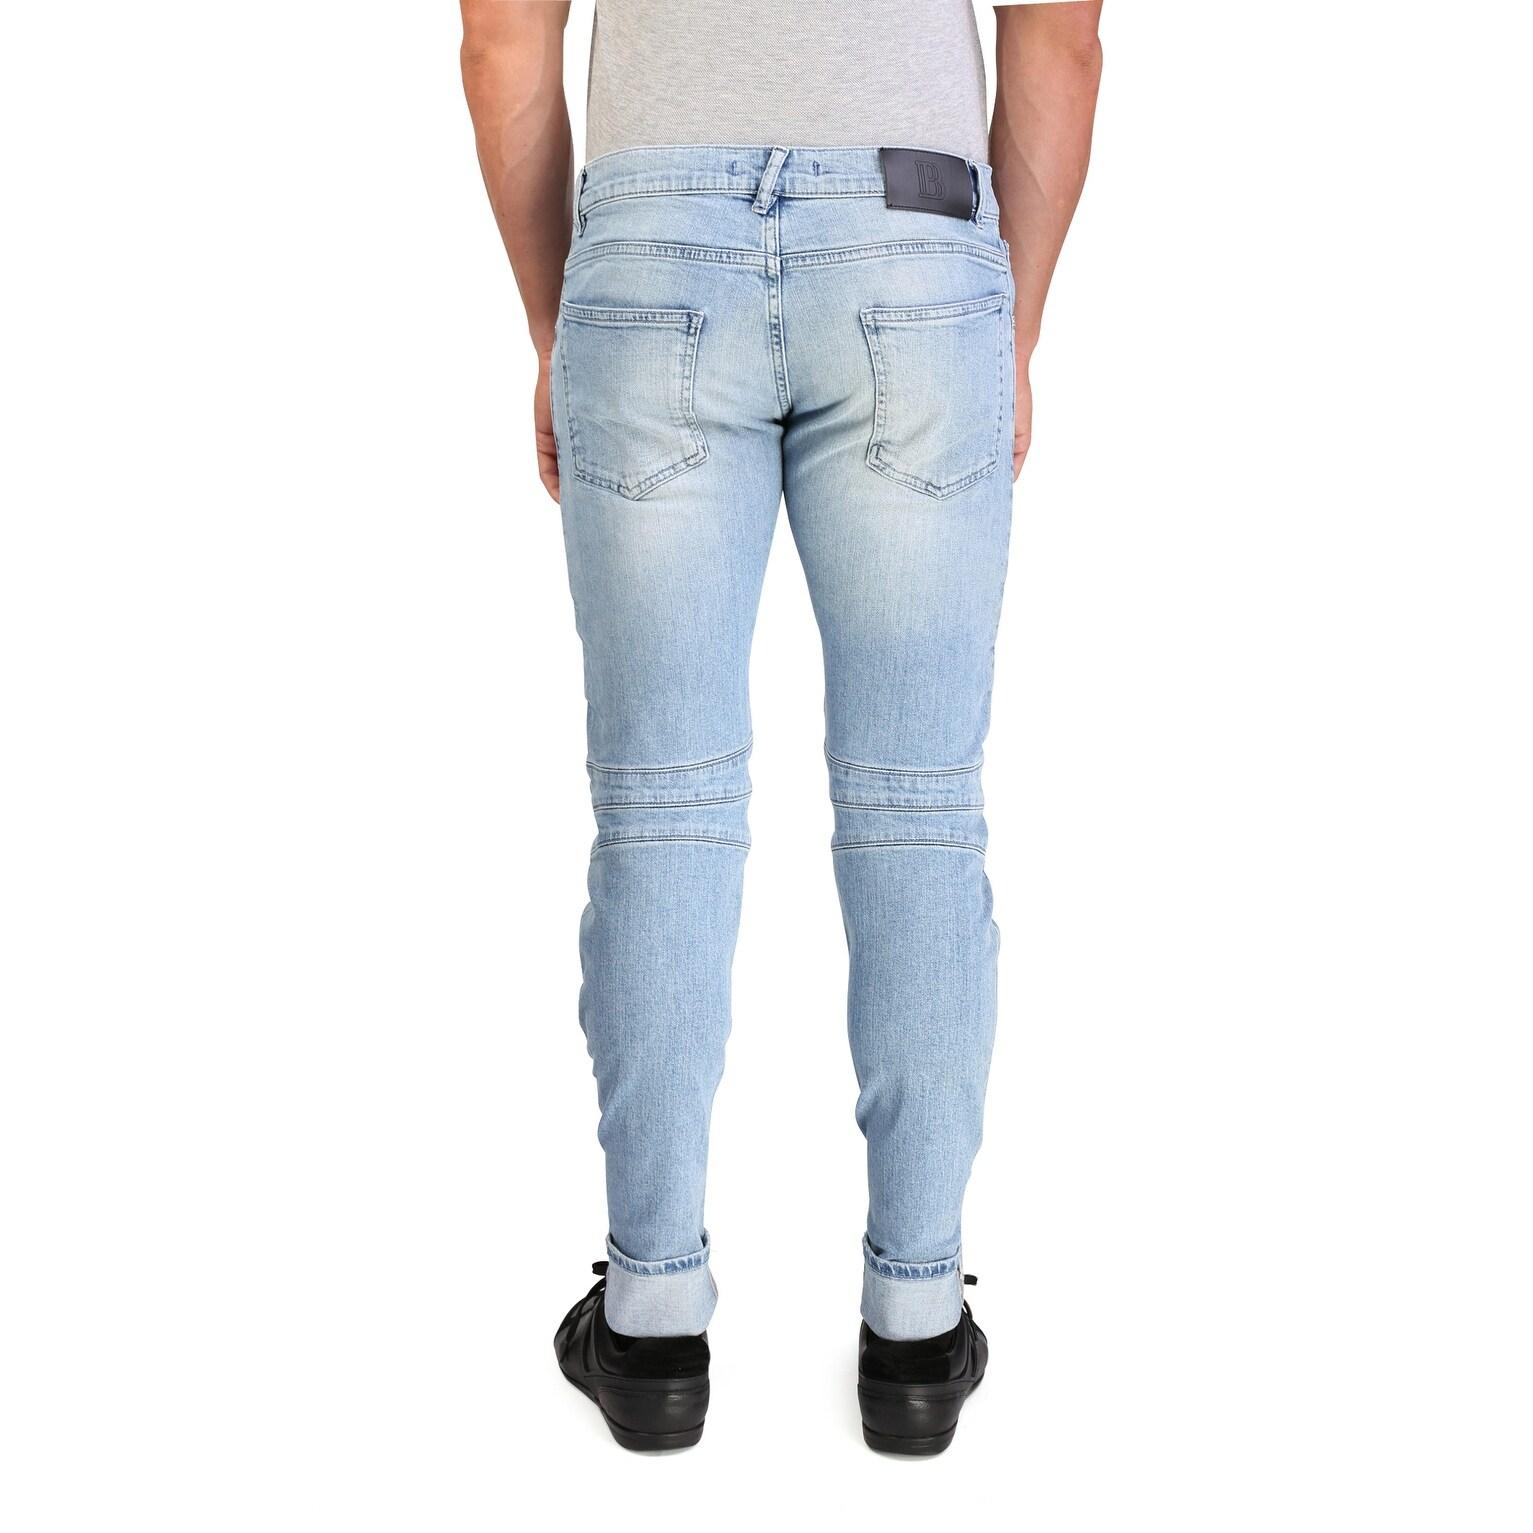 873bd853 Shop Pierre Balmain Men's Skinny Fit Biker Denim Jeans Pants Light Blue -  Free Shipping Today - Overstock - 17179783